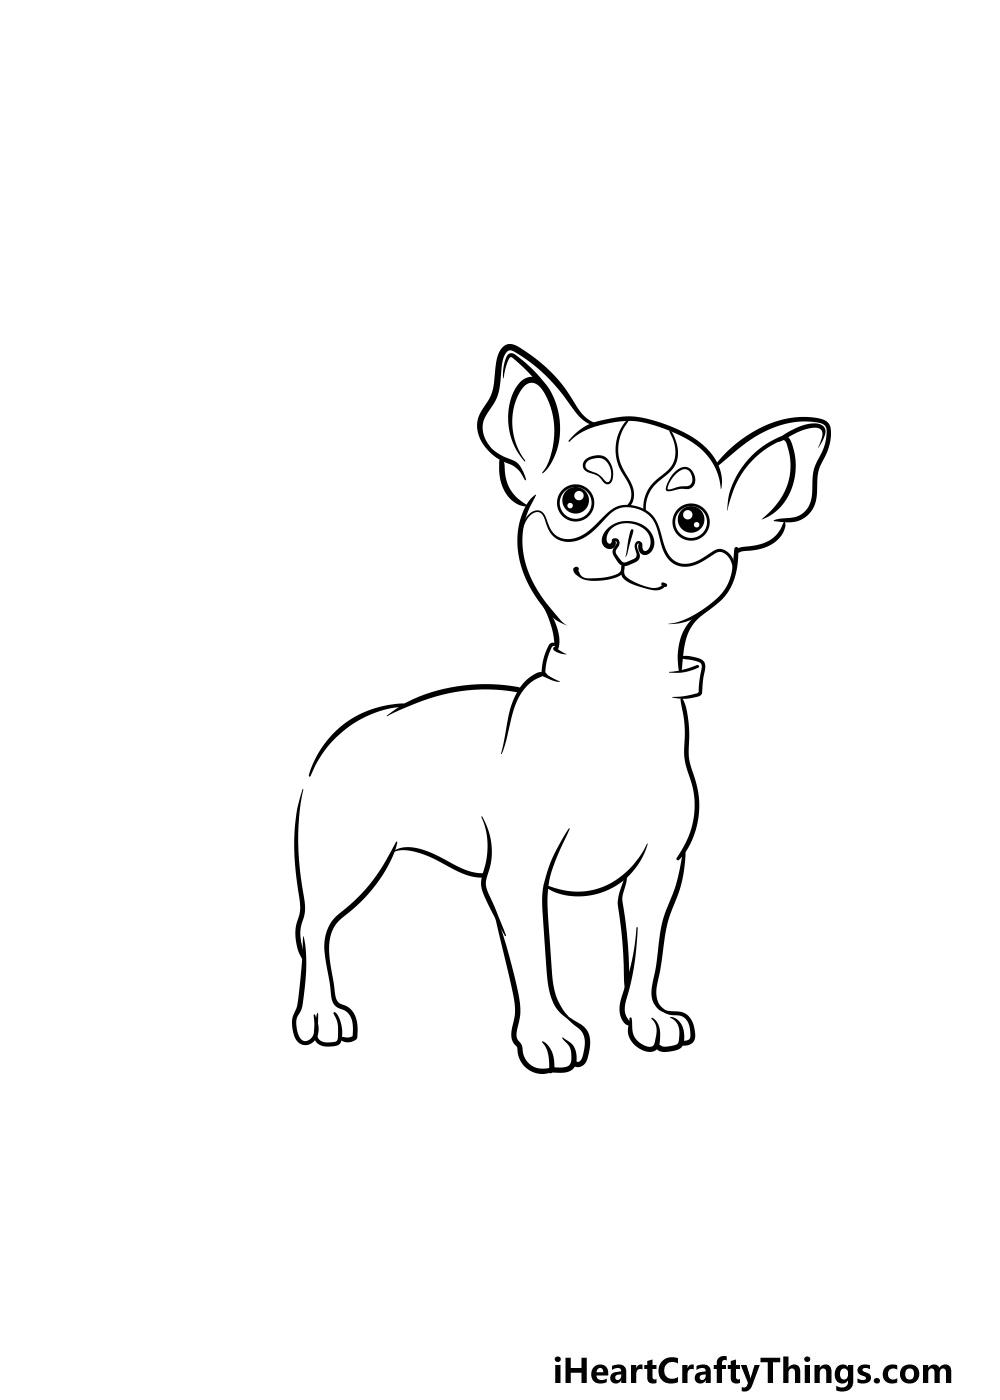 drawing a chihuahua step 5